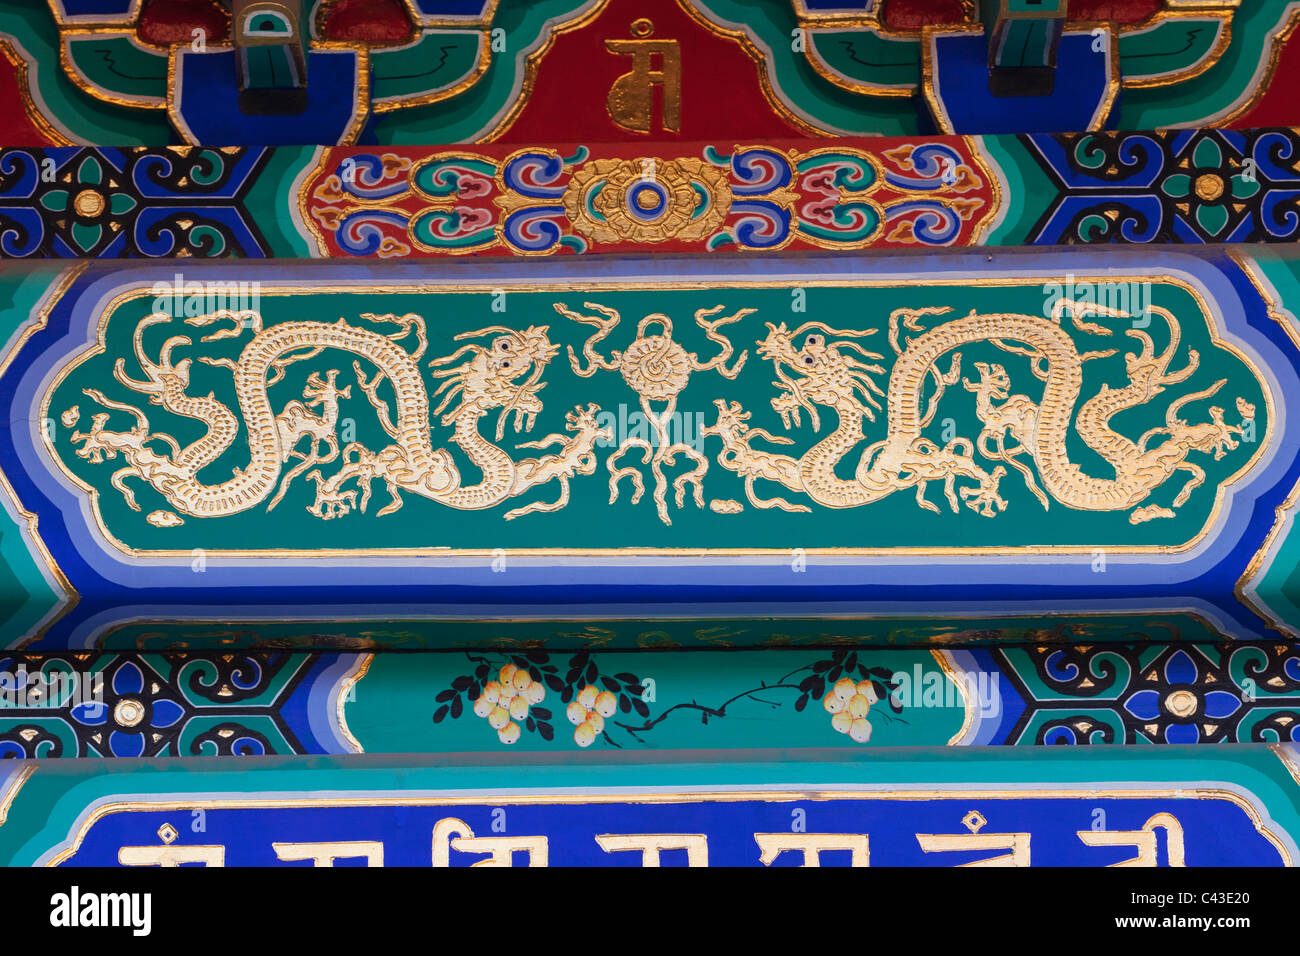 Asia, China, Beijing, Lama Temple, Yonghe Gong, Yonghegong, Tibetan Temple, Dragon, Dragons, Chinese Dragon, Buddhist, - Stock Image